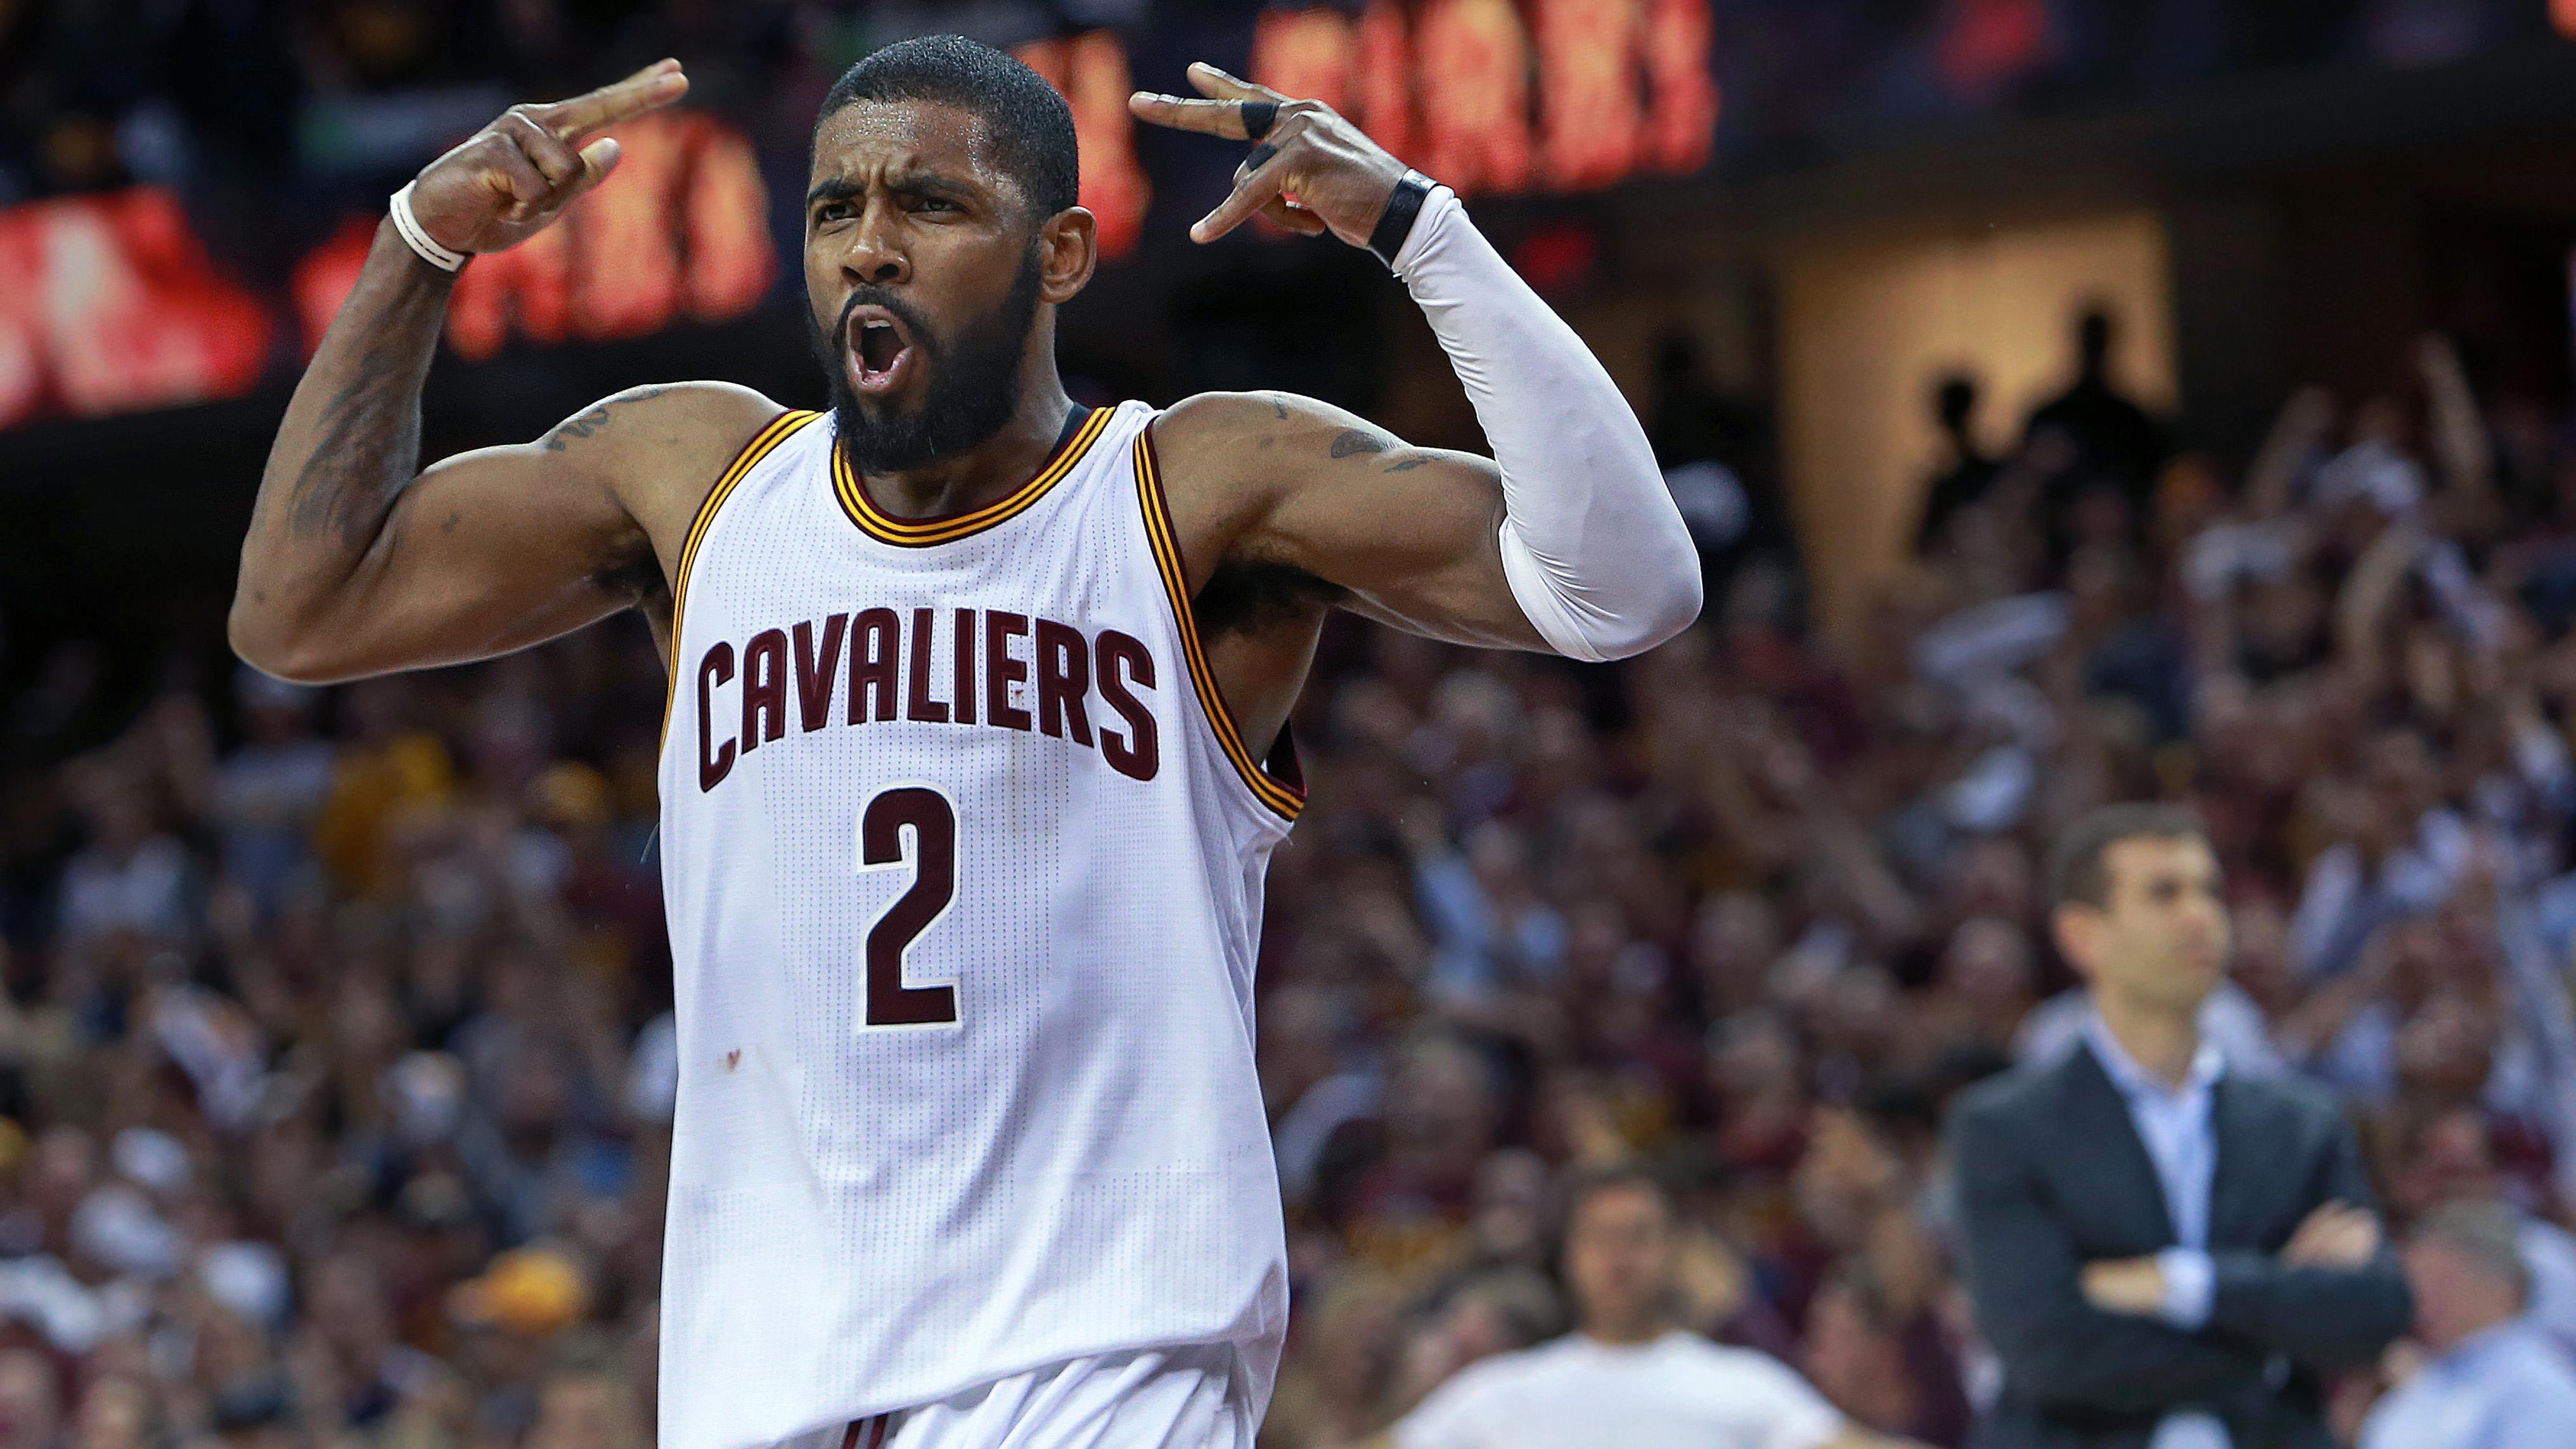 NBA Eastern Conf. Finals: Boston Celtics Vs Cleveland Cavaliers At Quicken Loans Arena